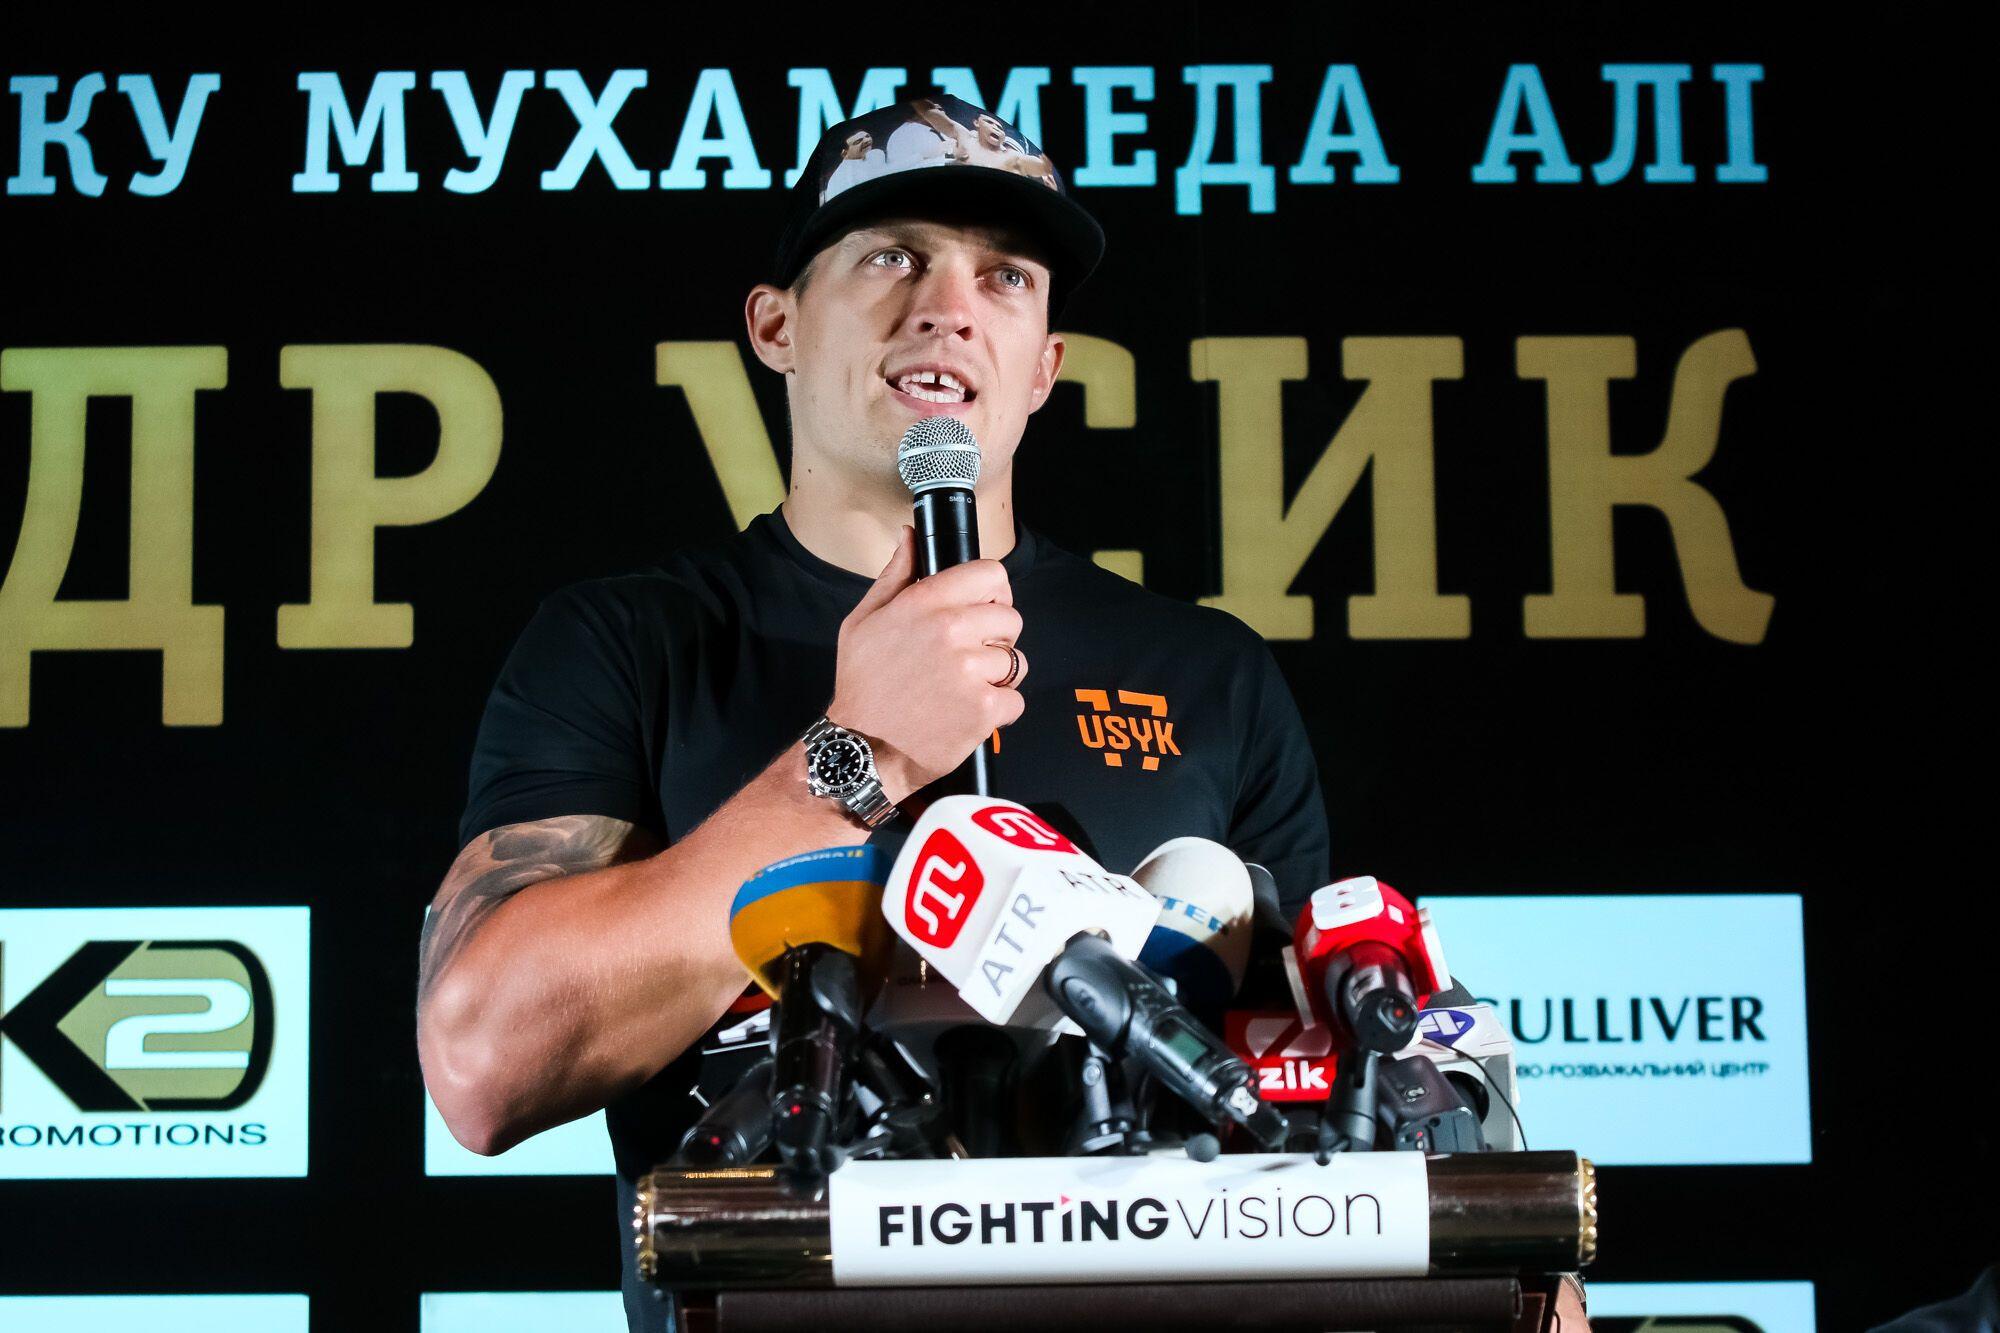 K2 Promotions Ukraine